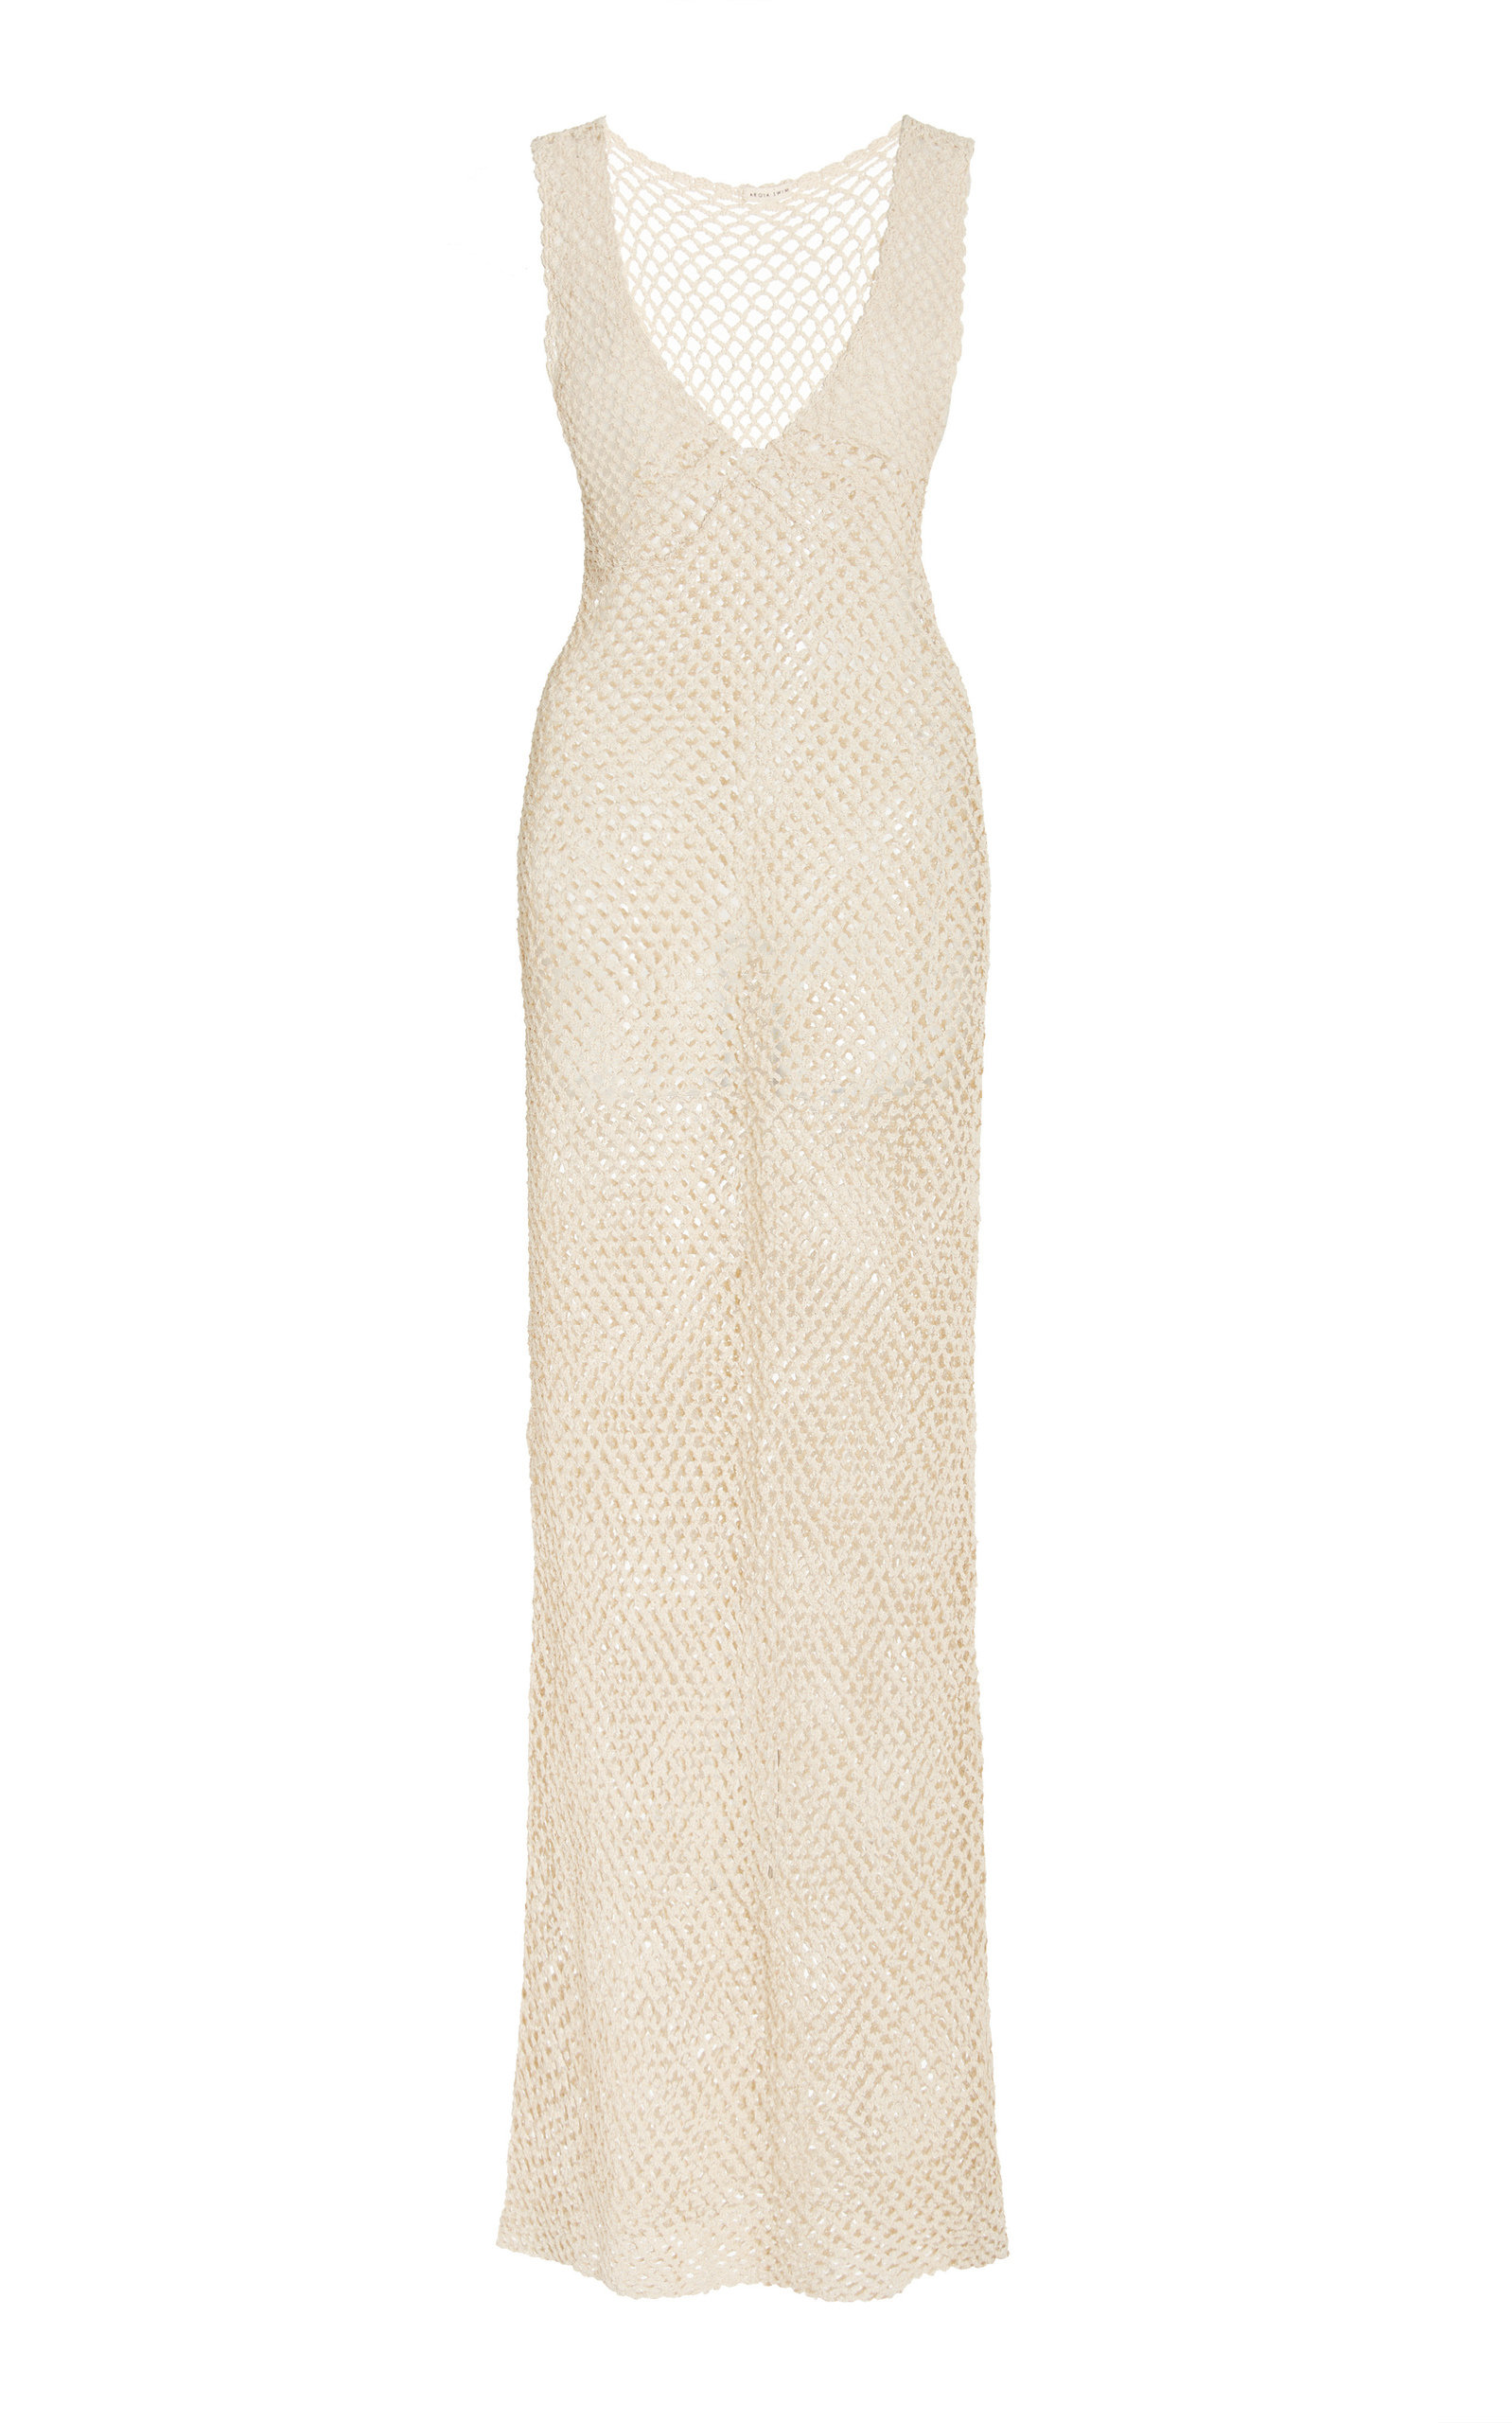 Women's Karu Crocheted Cotton Maxi Dress